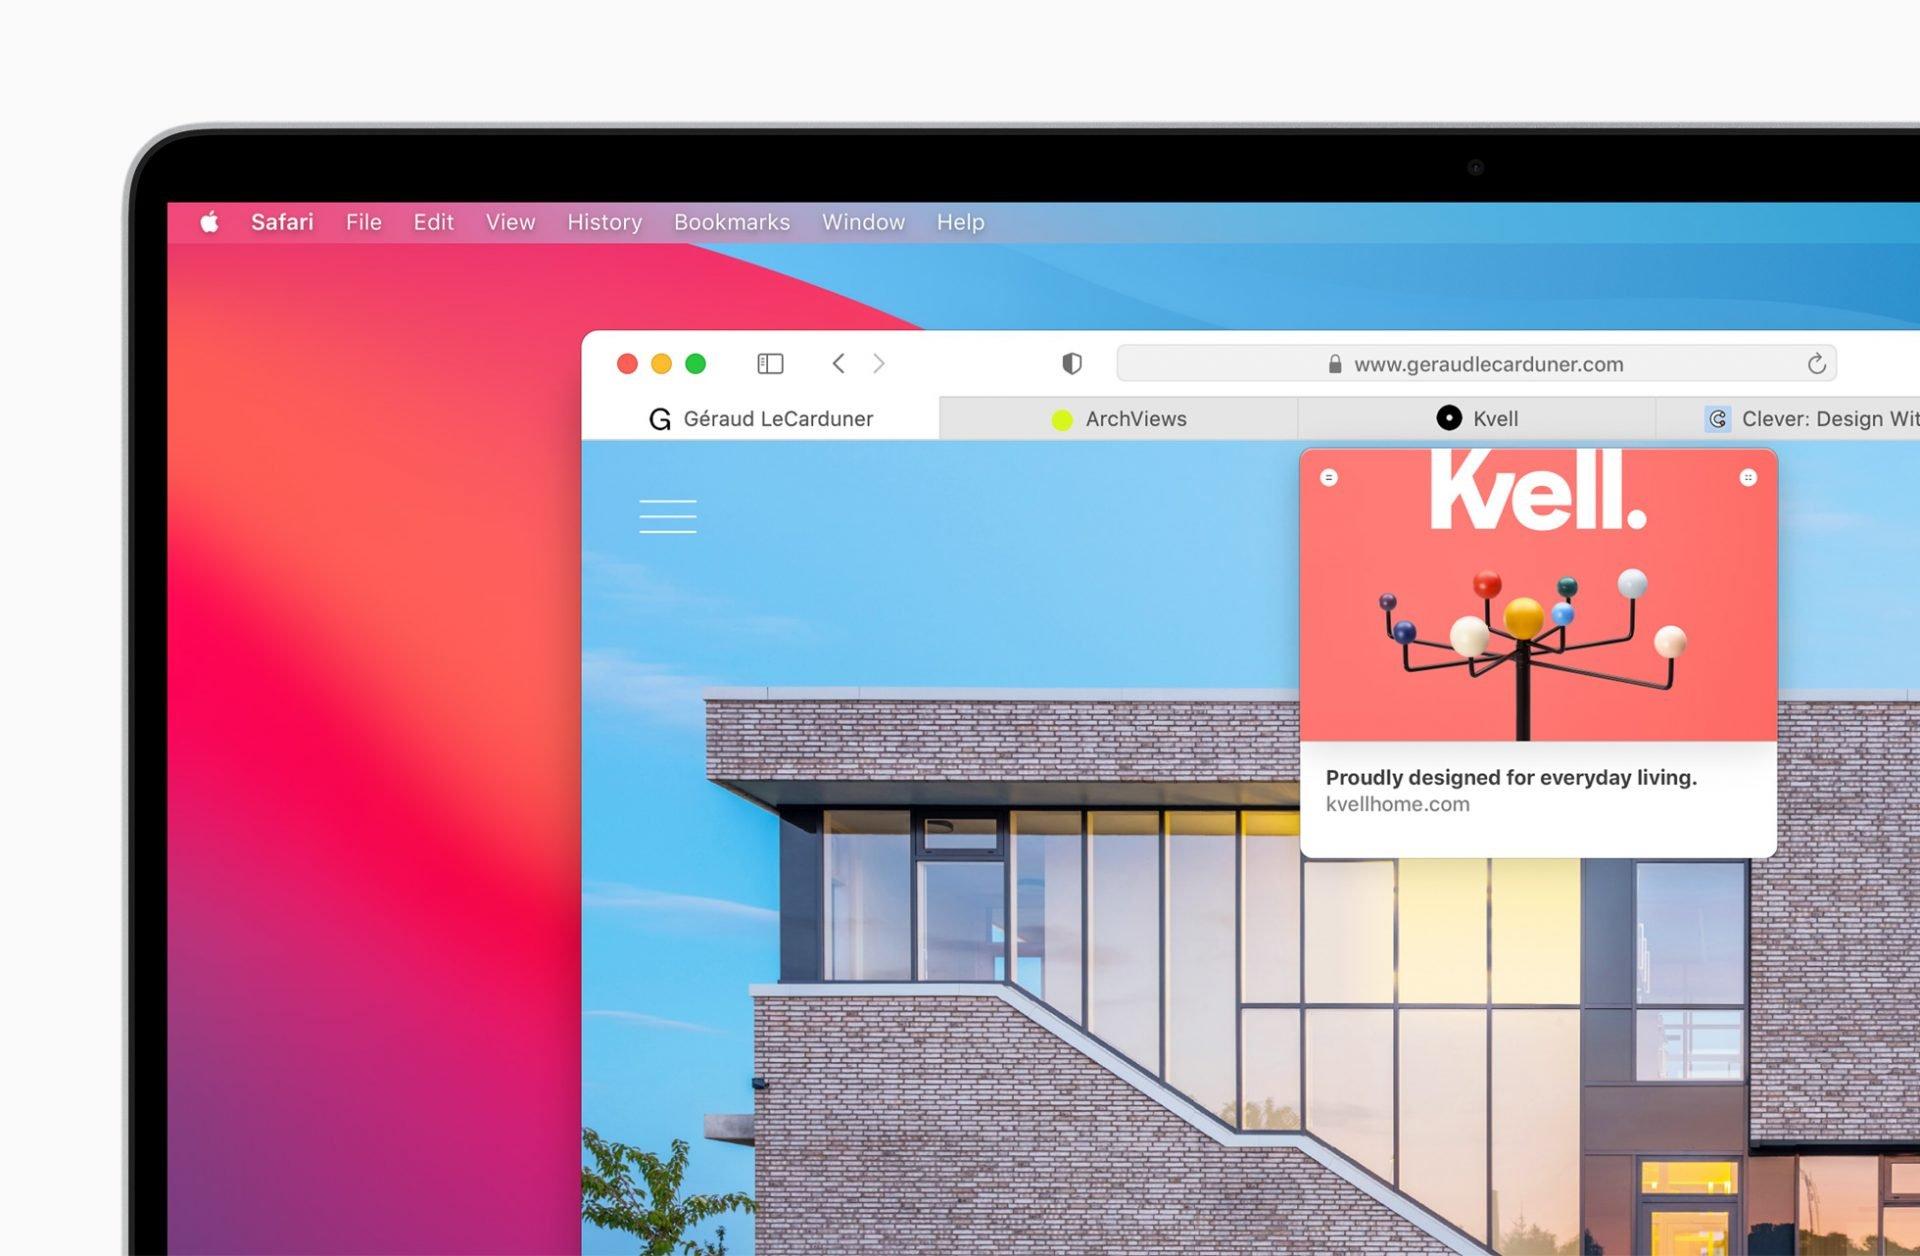 Safari 可以预览Tab 页面的内容。